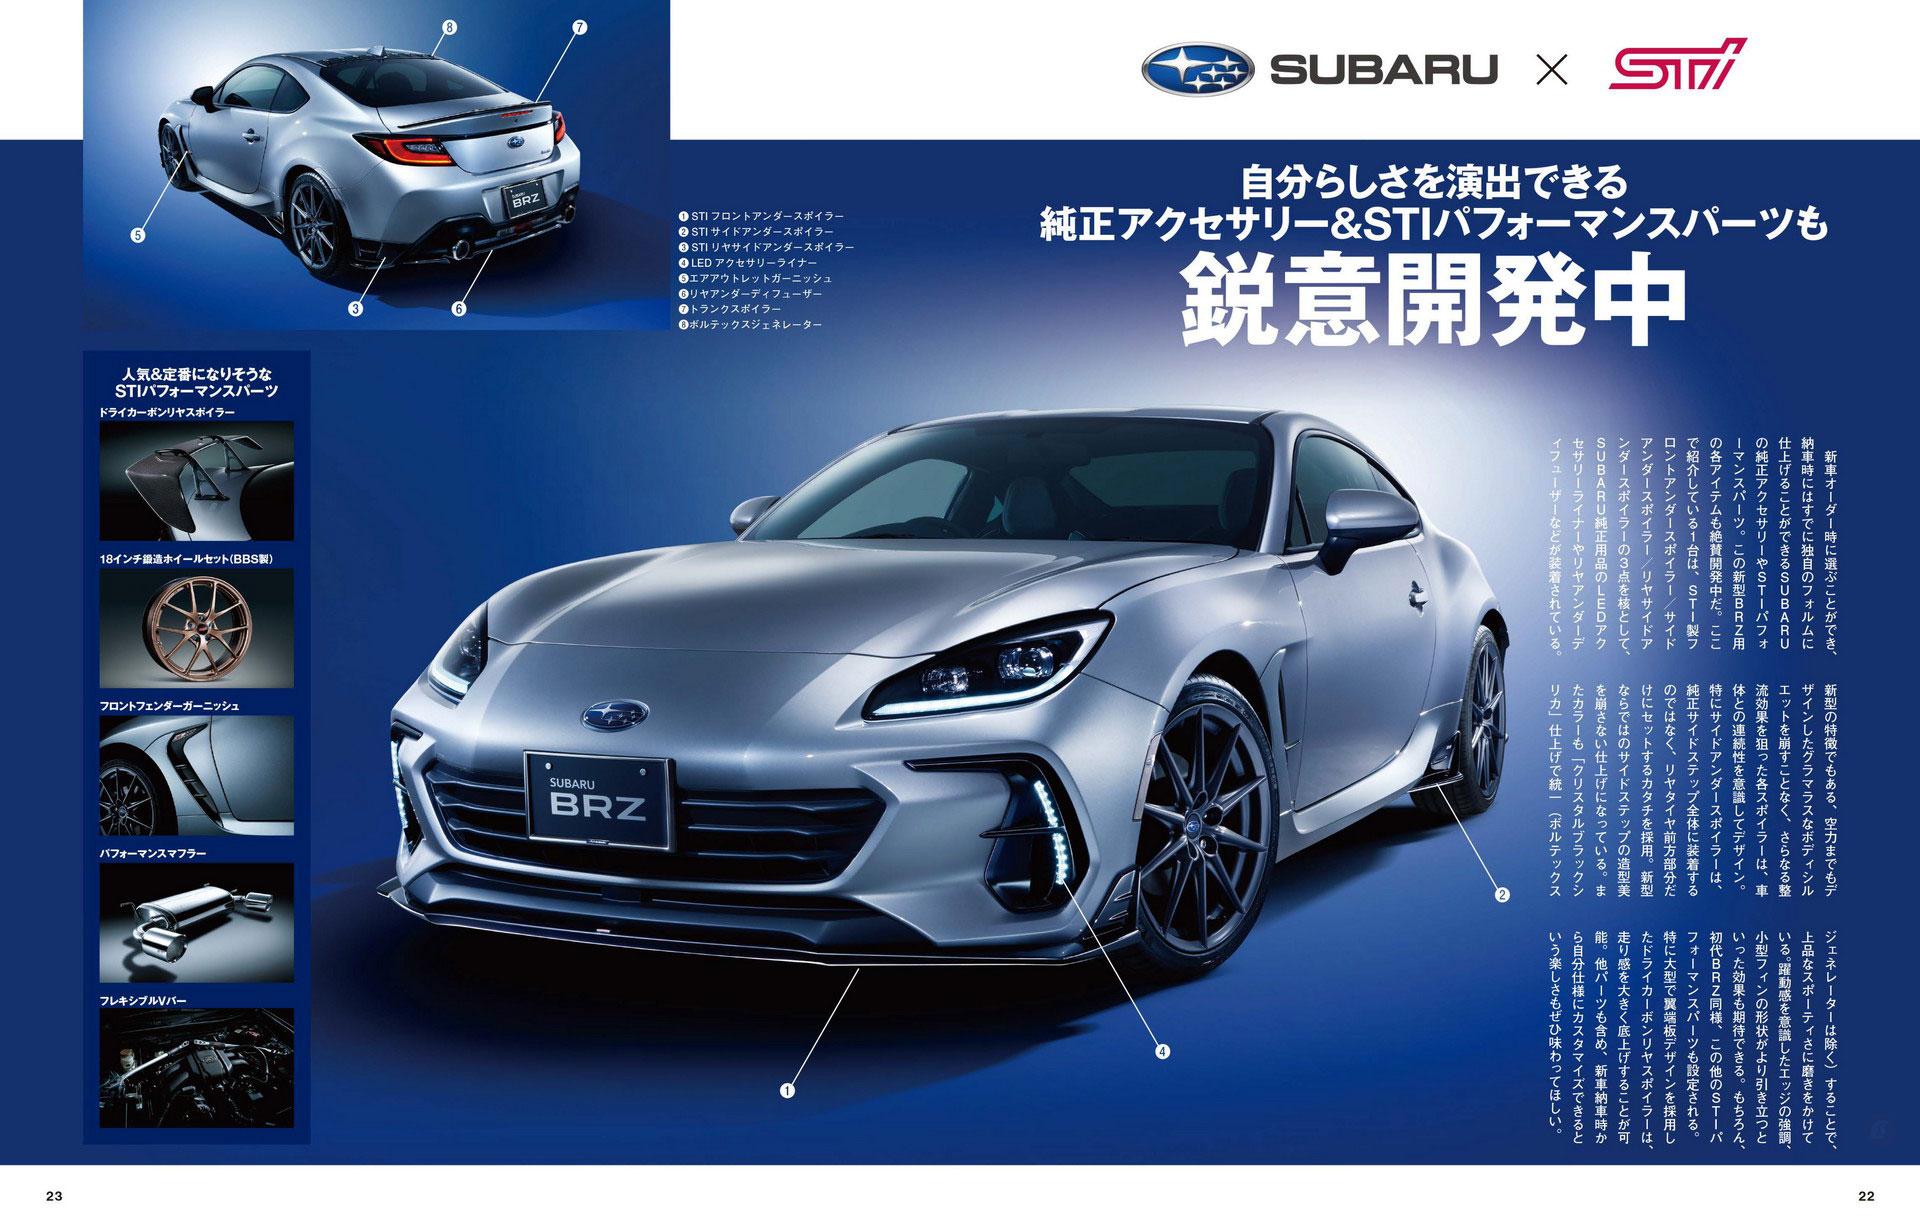 Subaru-BRZ-STI-Performance-parts-8